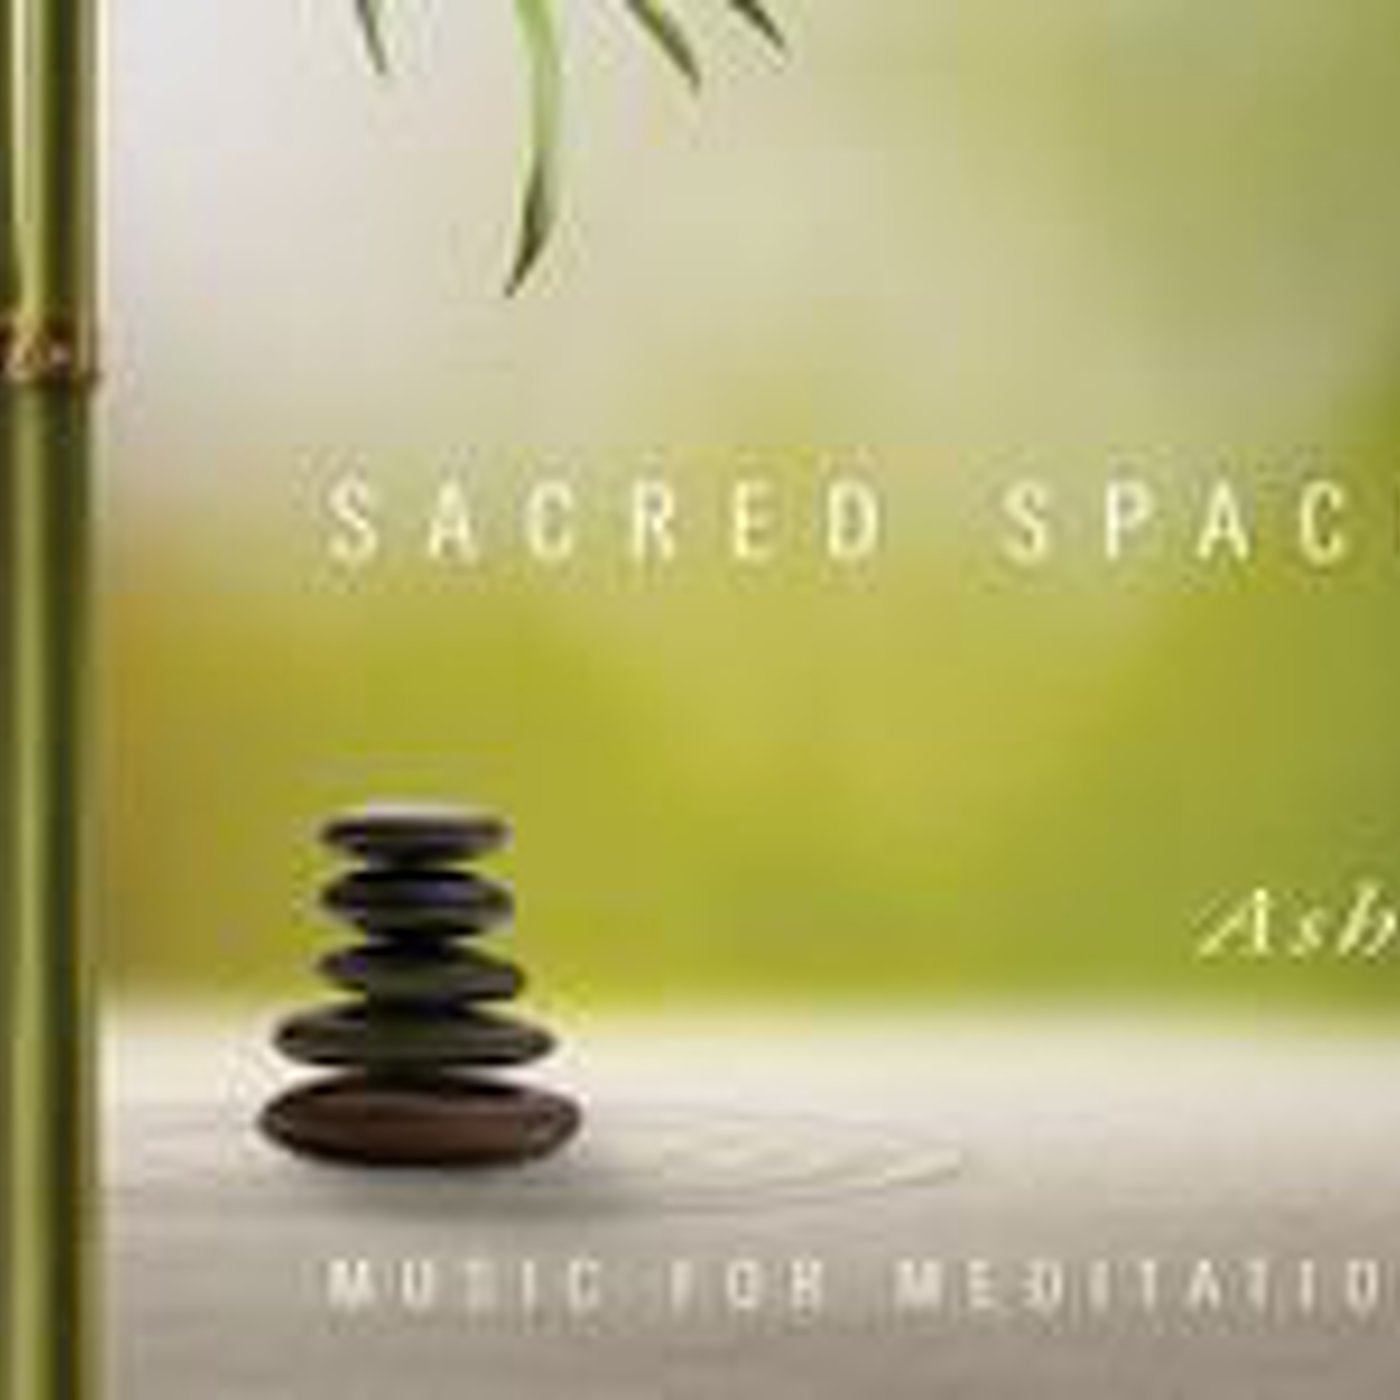 Music For Meditatión: Sacred Space (Ashi)